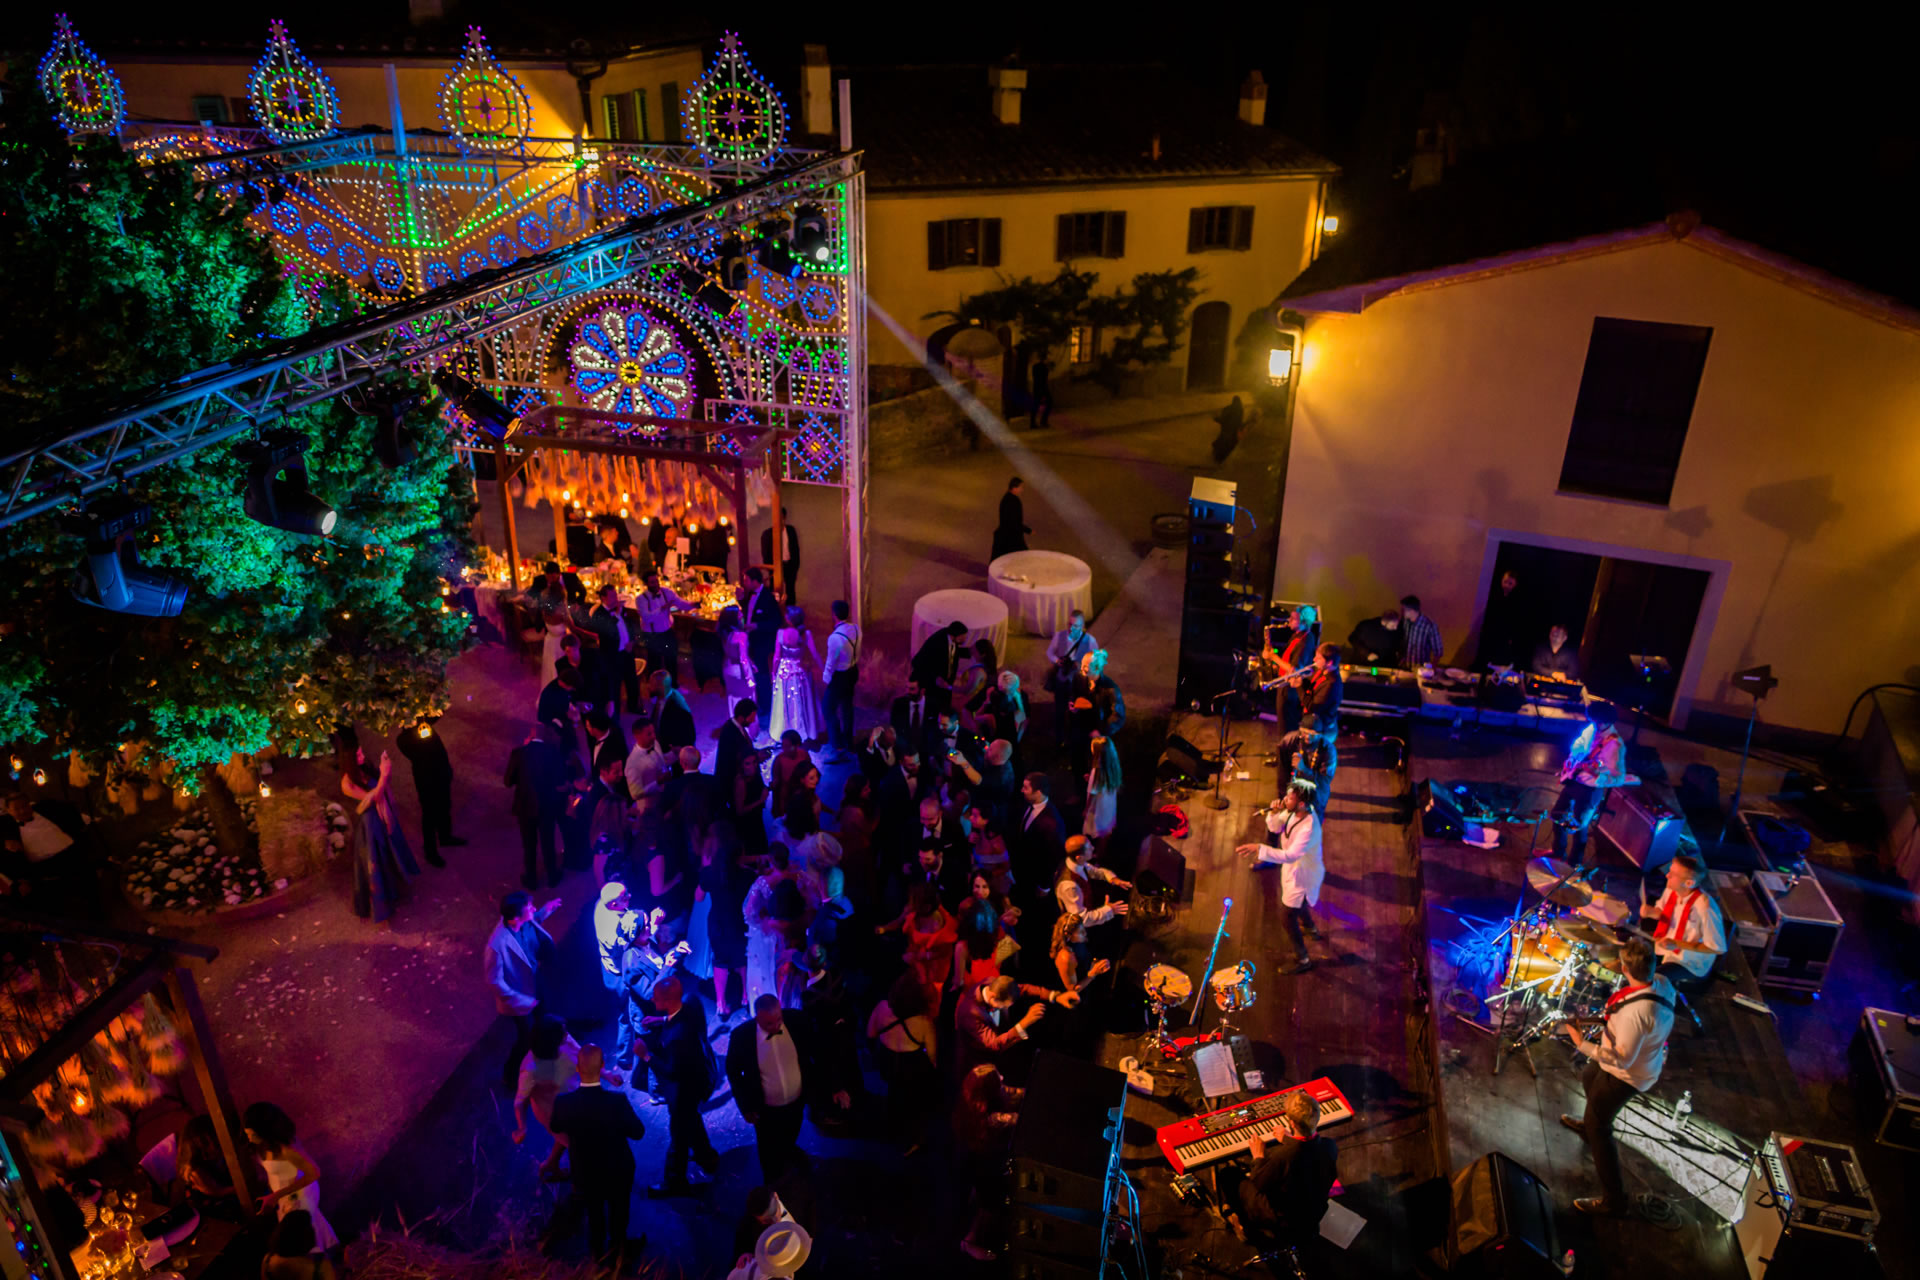 Musician - 74 :: Luxury wedding at Il Borro :: Luxury wedding photography - 73 :: Musician - 74